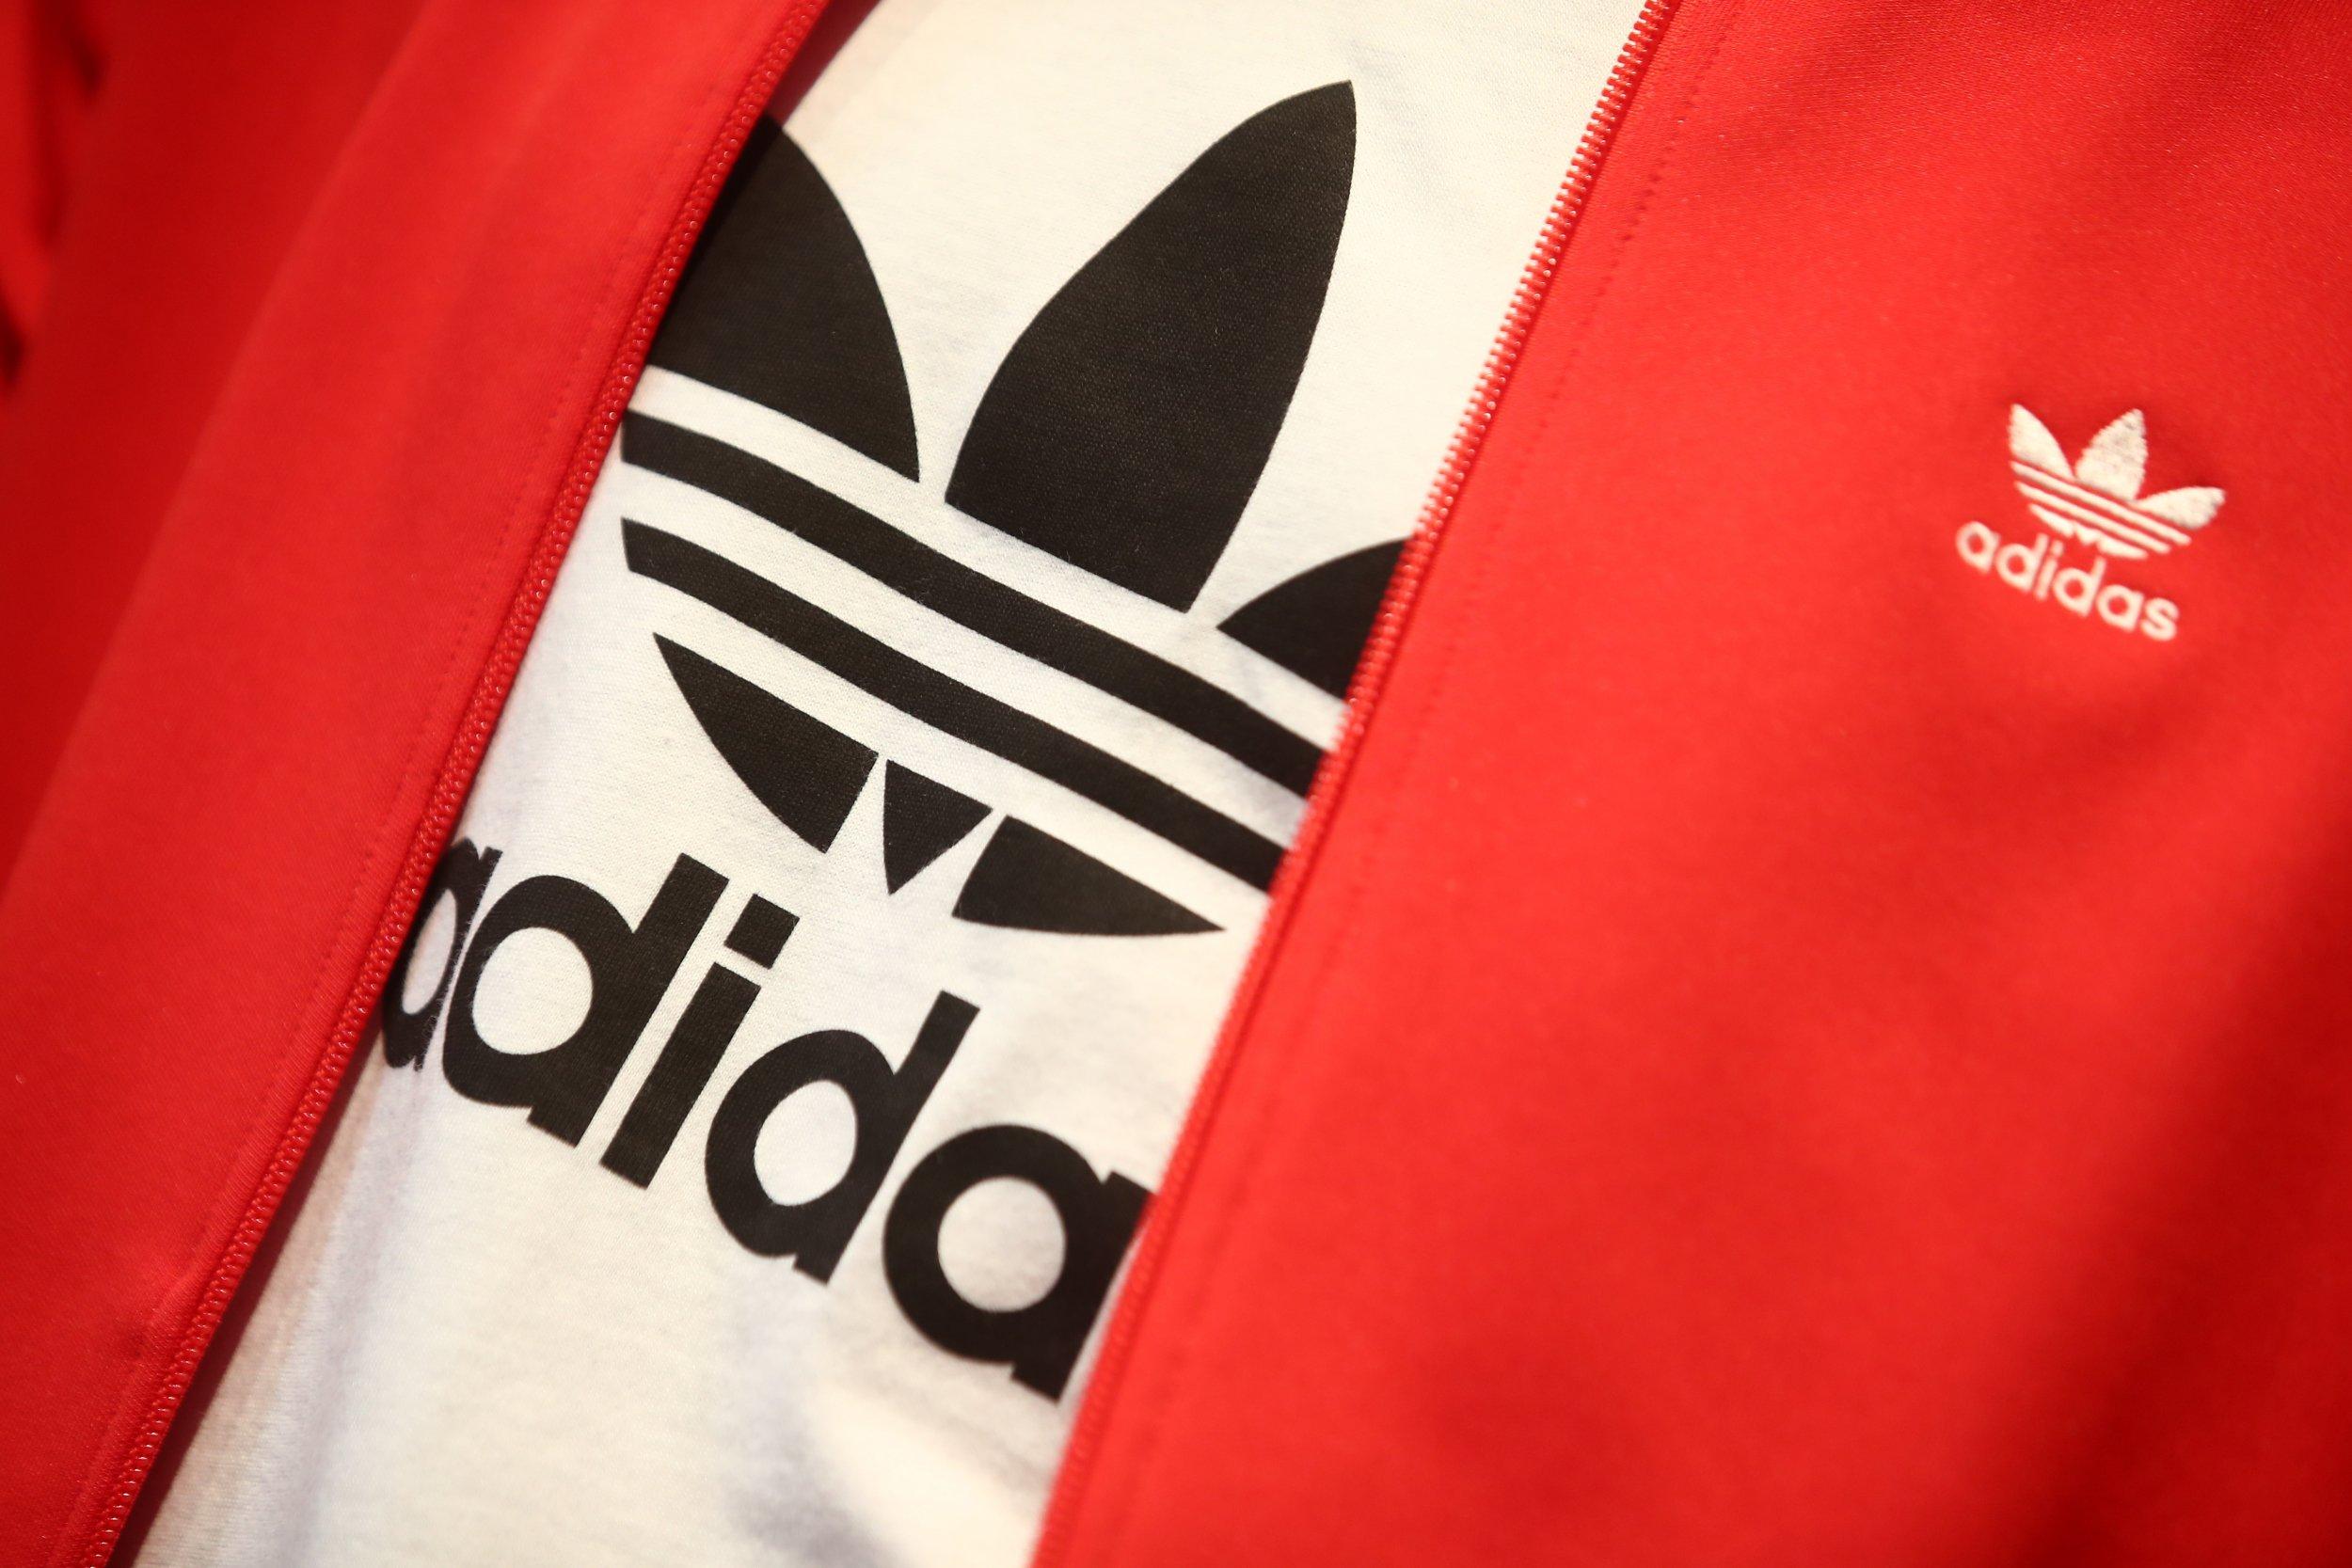 low priced fa0e1 cdfa5 Adidas Hack Millions of U.S. Website Customers Warned of Cyb